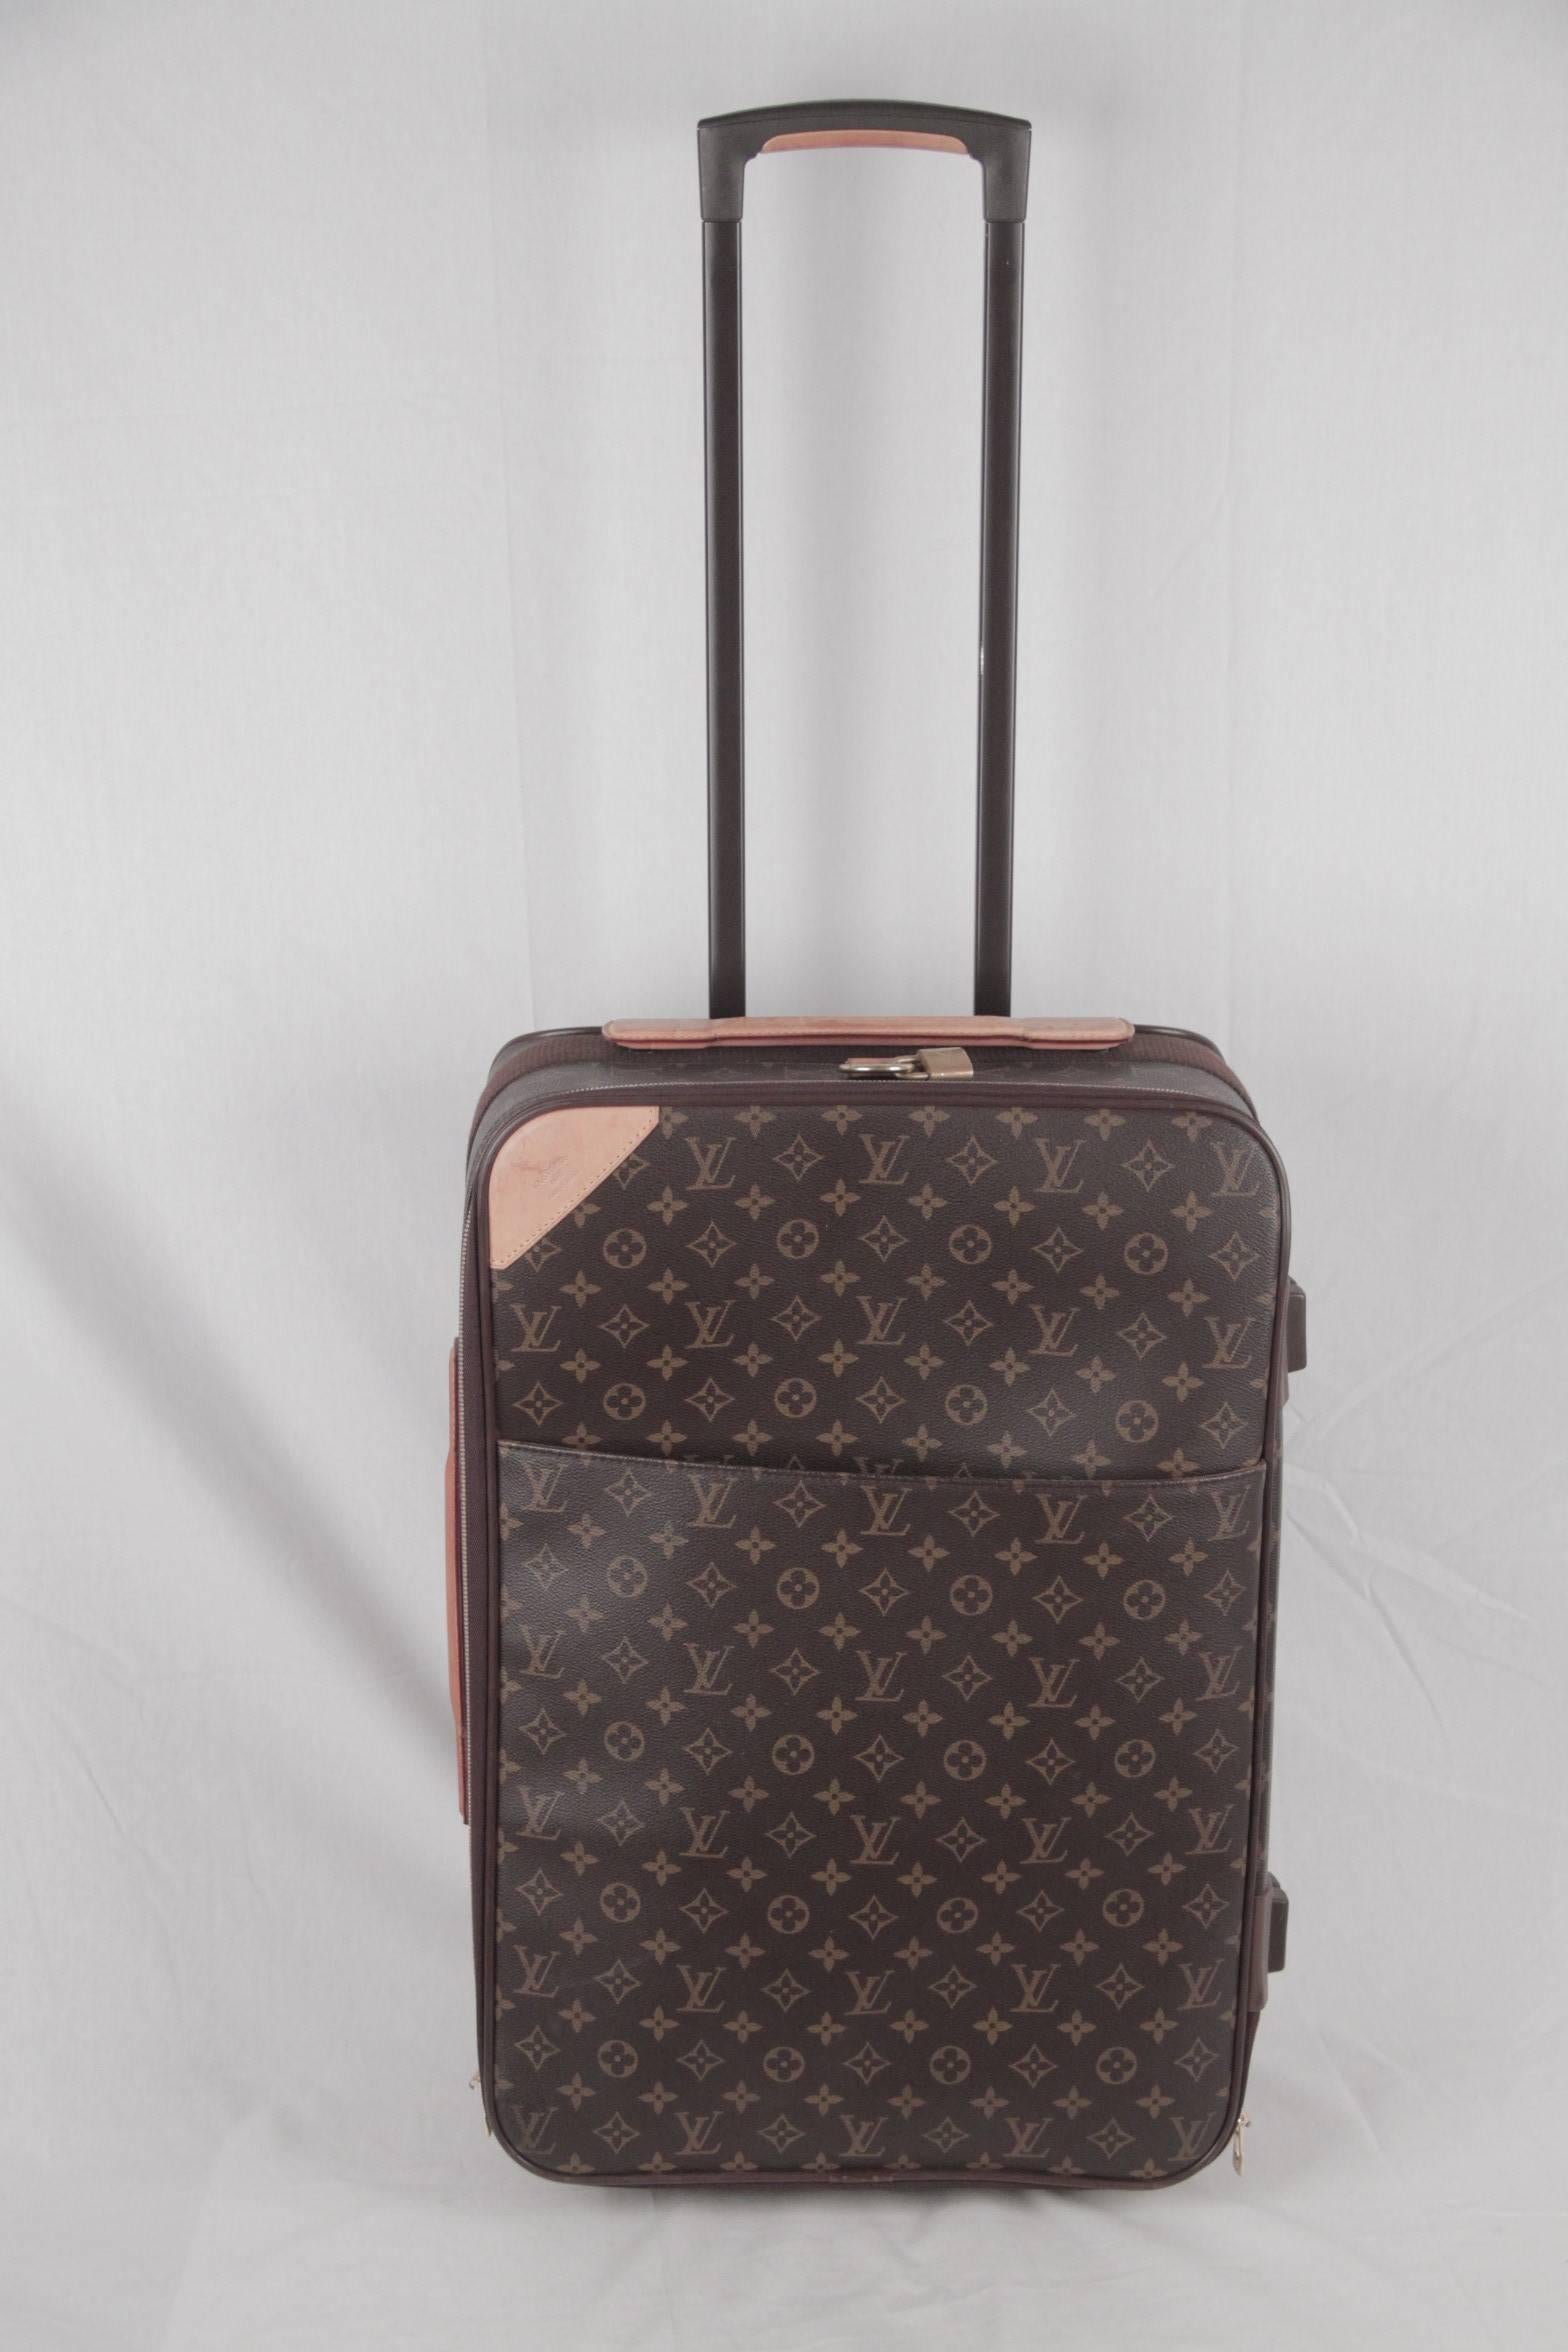 fae154a5dc71 LOUIS VUITTON Monogram Canvas PEGASE 60 Rolling SUITCASE Travel Bag at  1stdibs